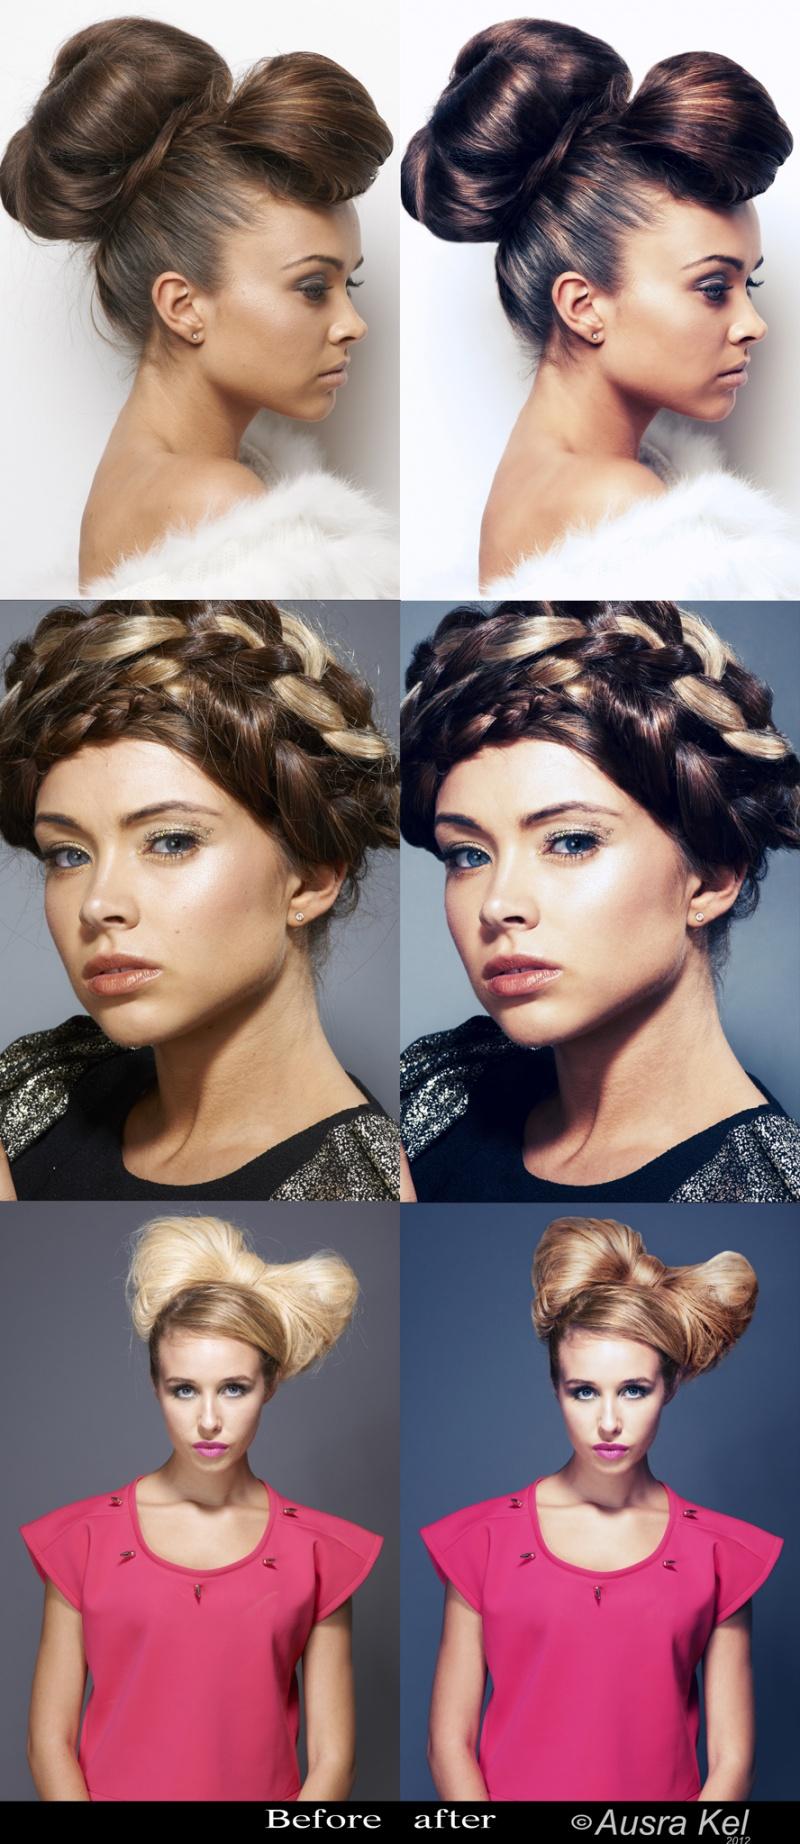 Oct 05, 2012 Hair stylist - Tatiana Hair Extensions